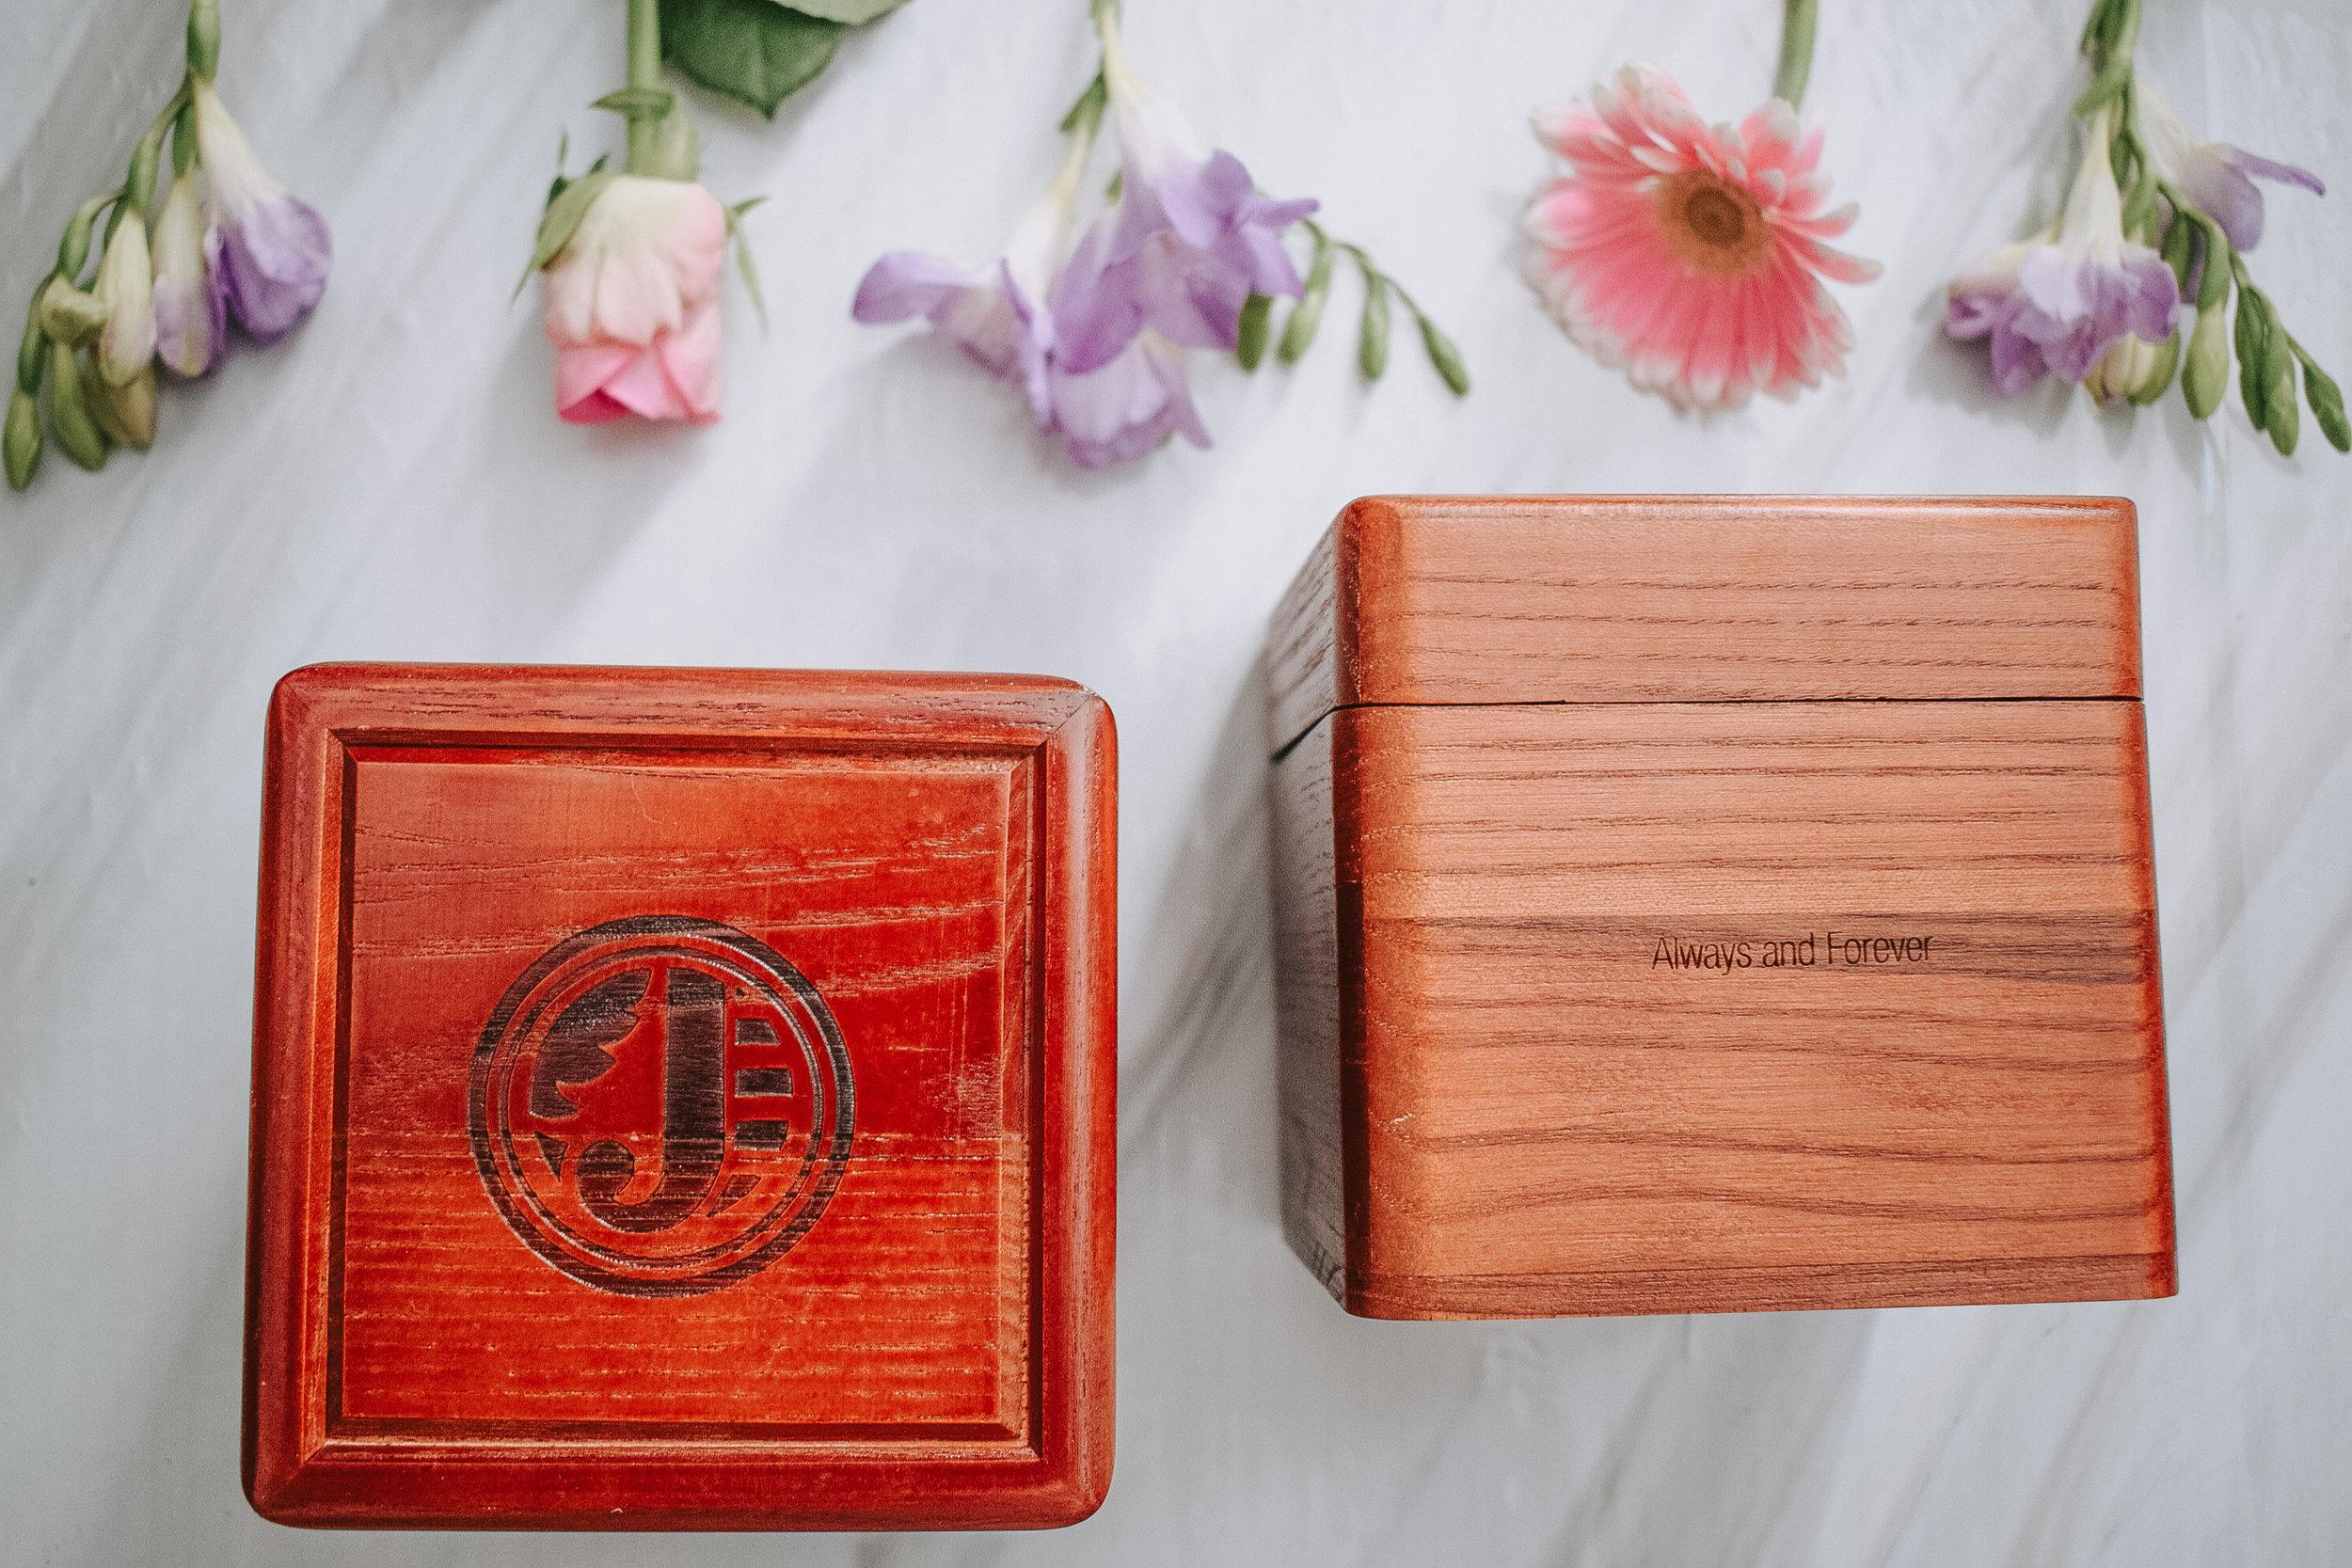 Jord wood watch box